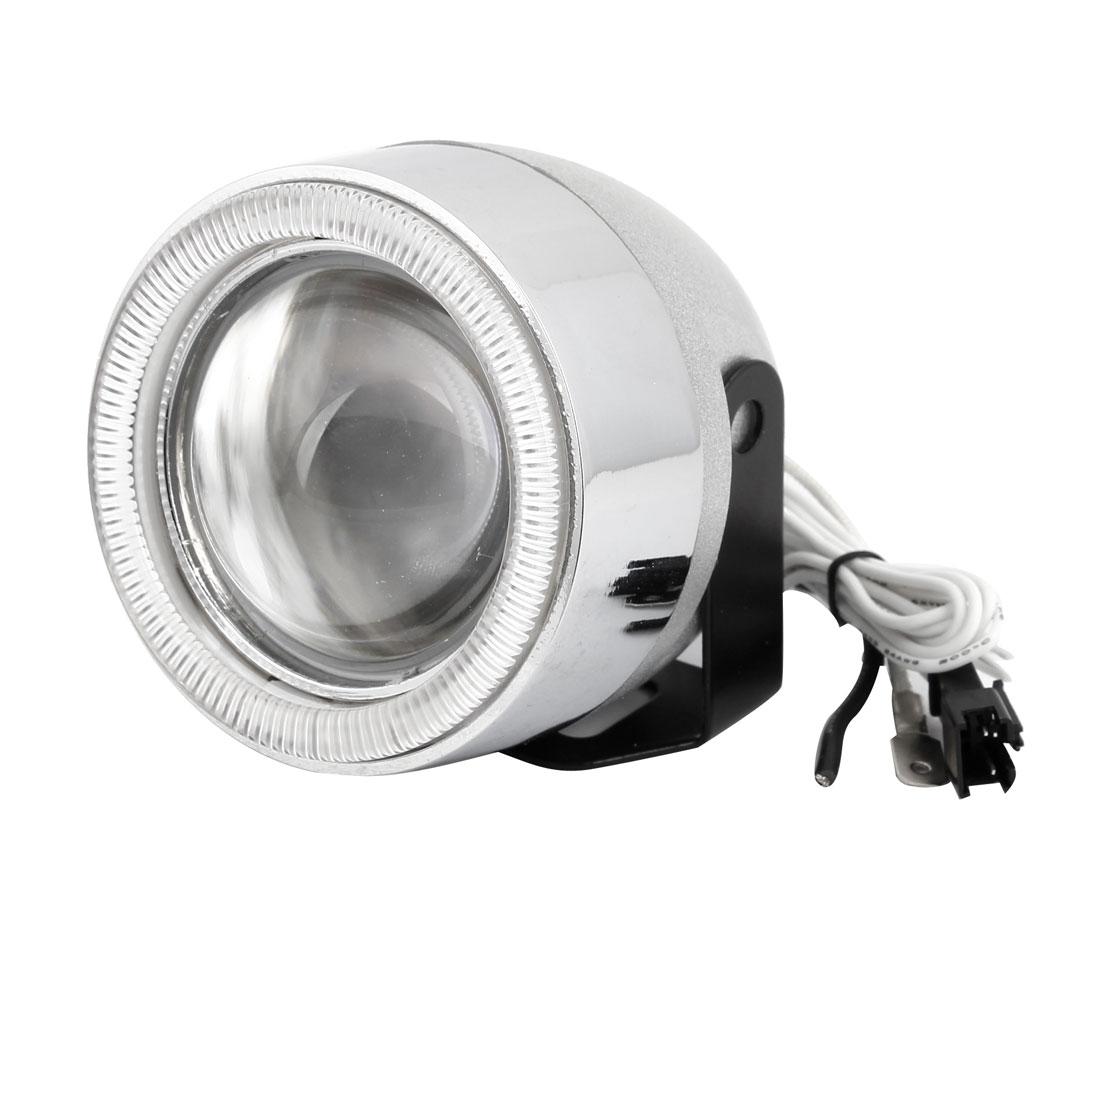 2 Pcs Auto Car Angel Eye Projector Lens HID Xenon Kit Headlamp Light Warm White DC 12V 55W